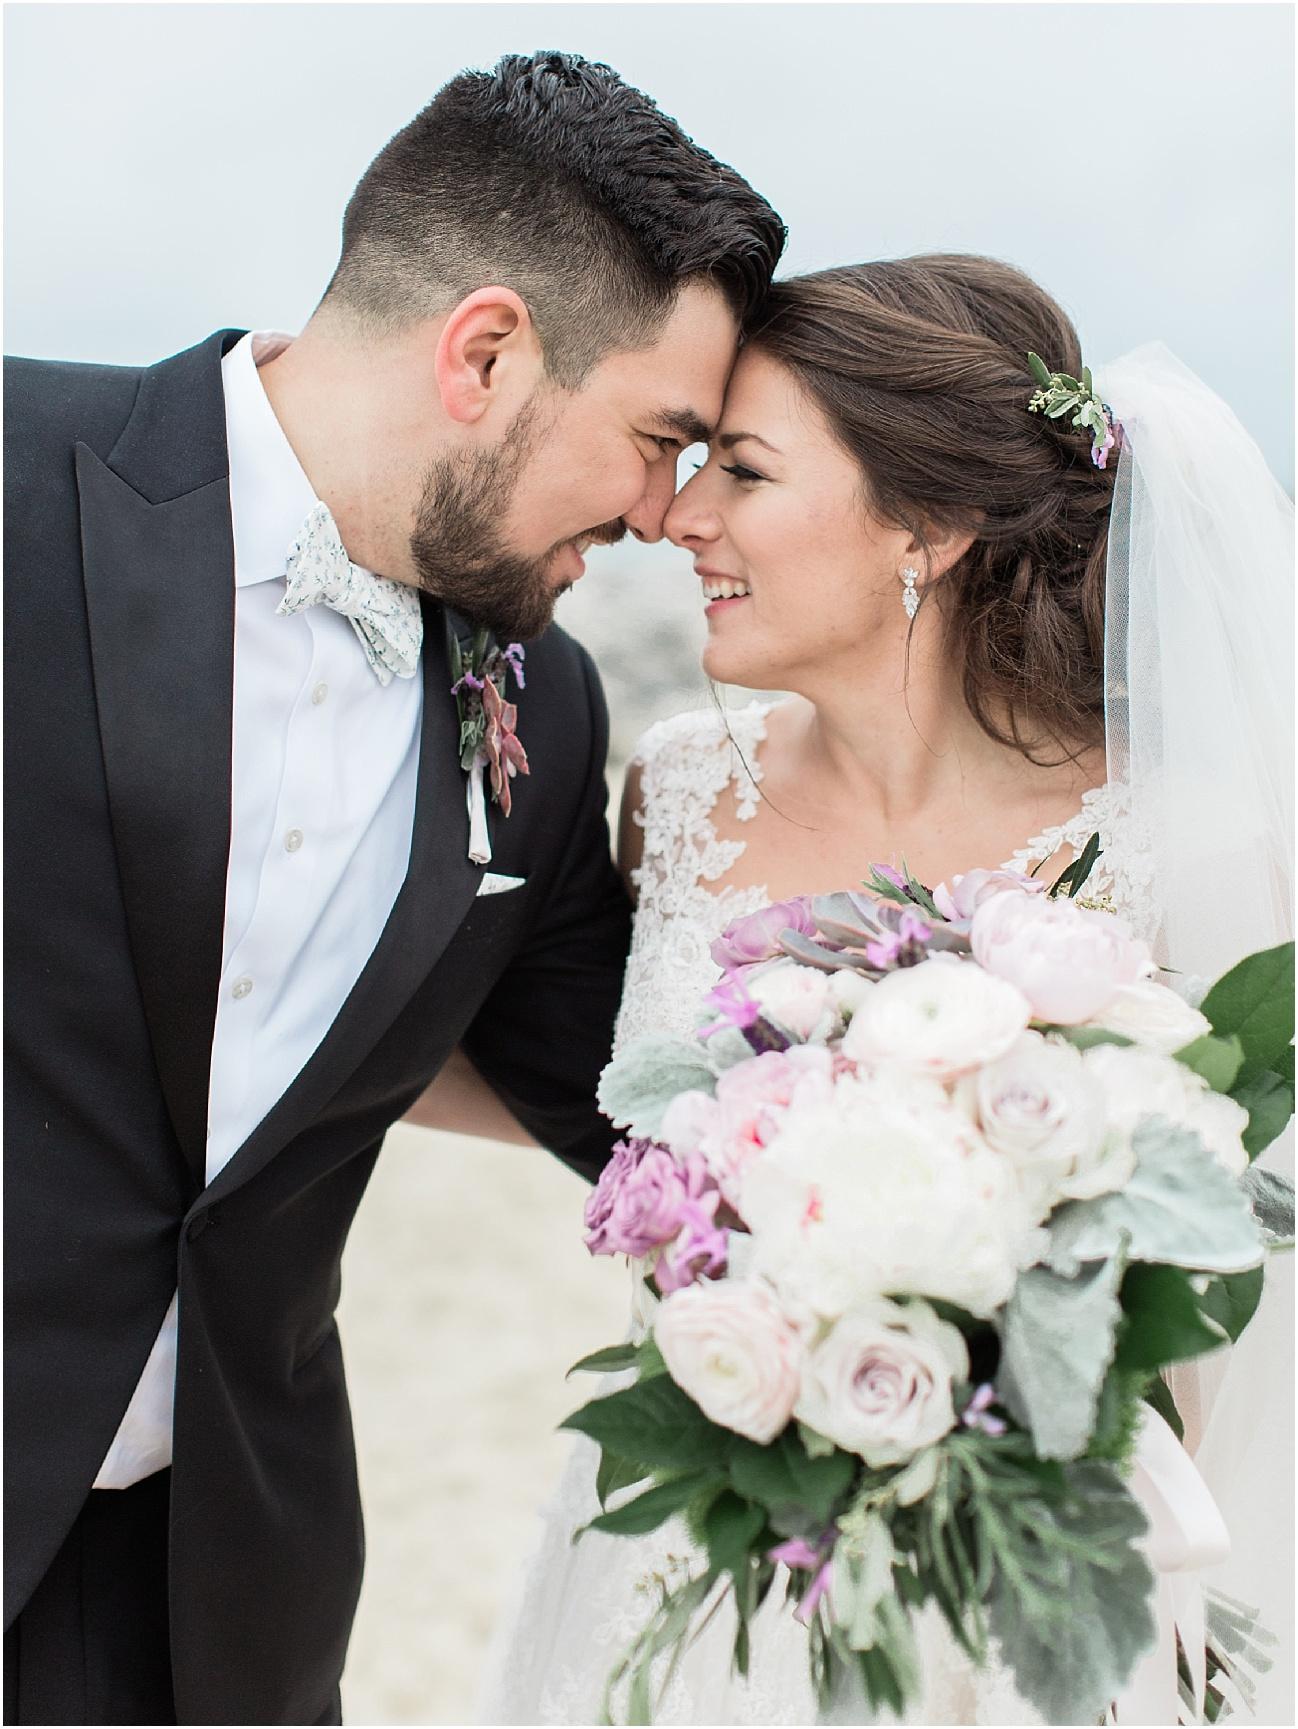 courtney_kurt_cape_cod_popponessett_inn_dowses_beach_boston_wedding_meredith_jane_photography_photo_0055.jpg